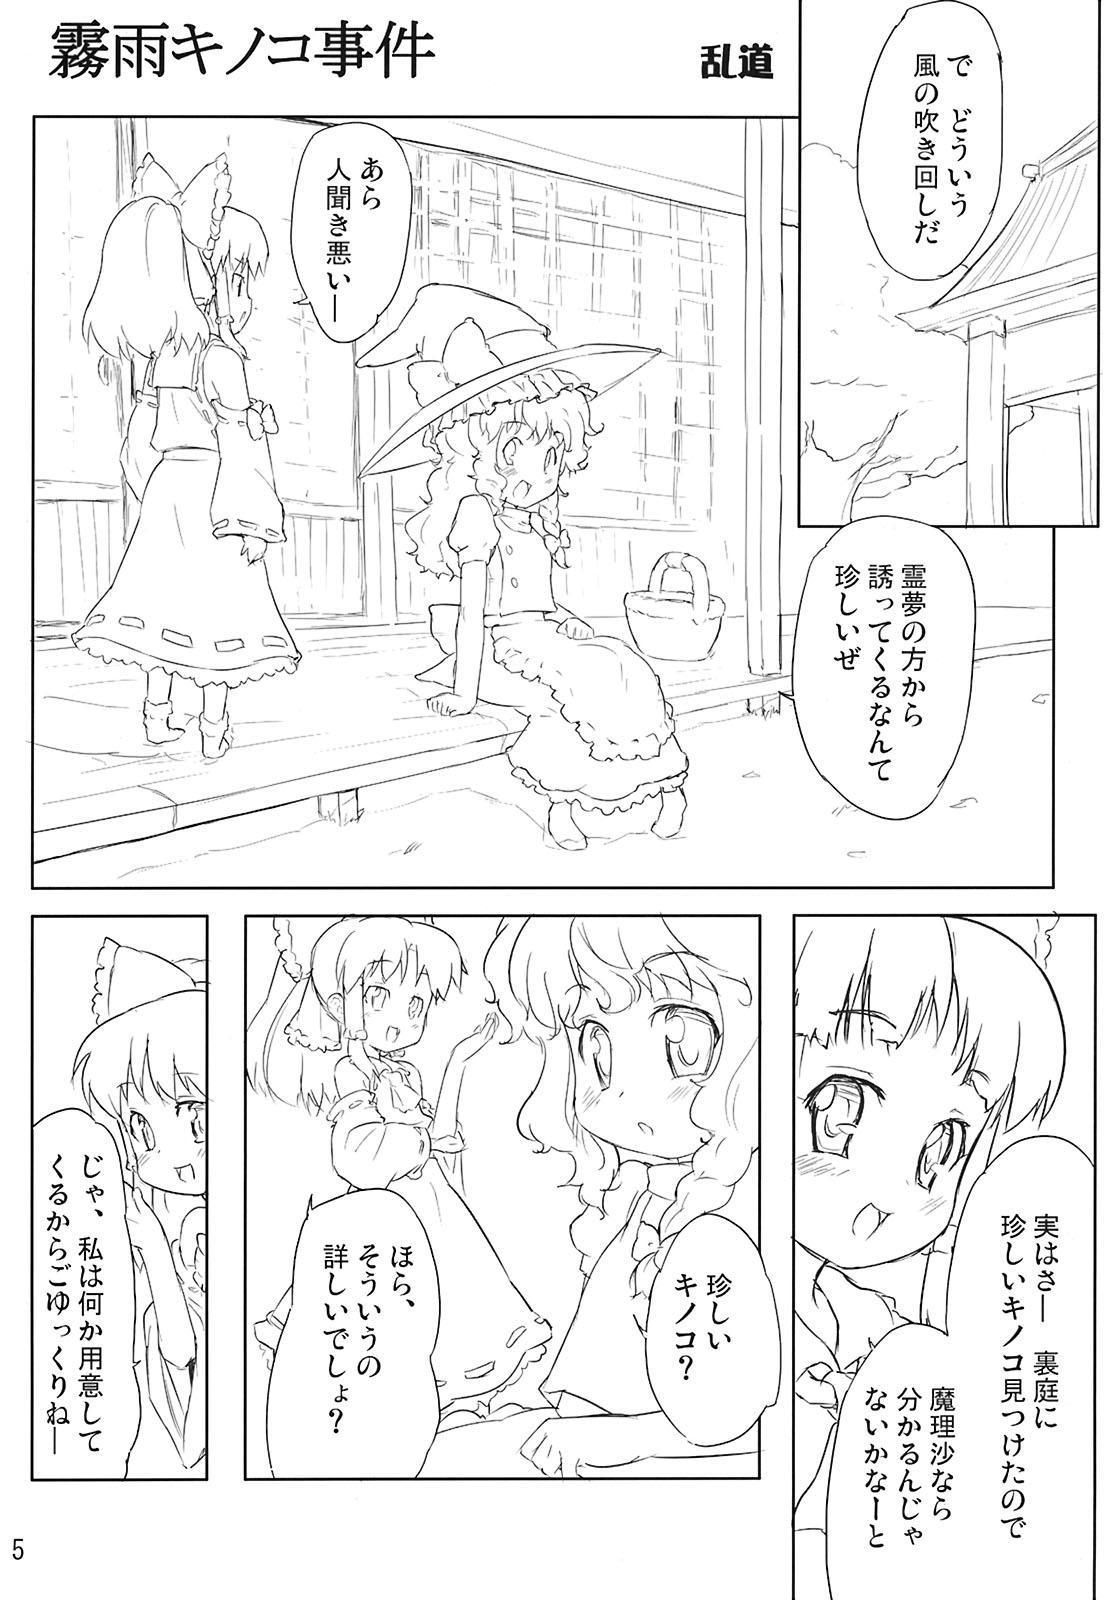 Kirisame Kinoko Jiken - cream of mushroom soup 4